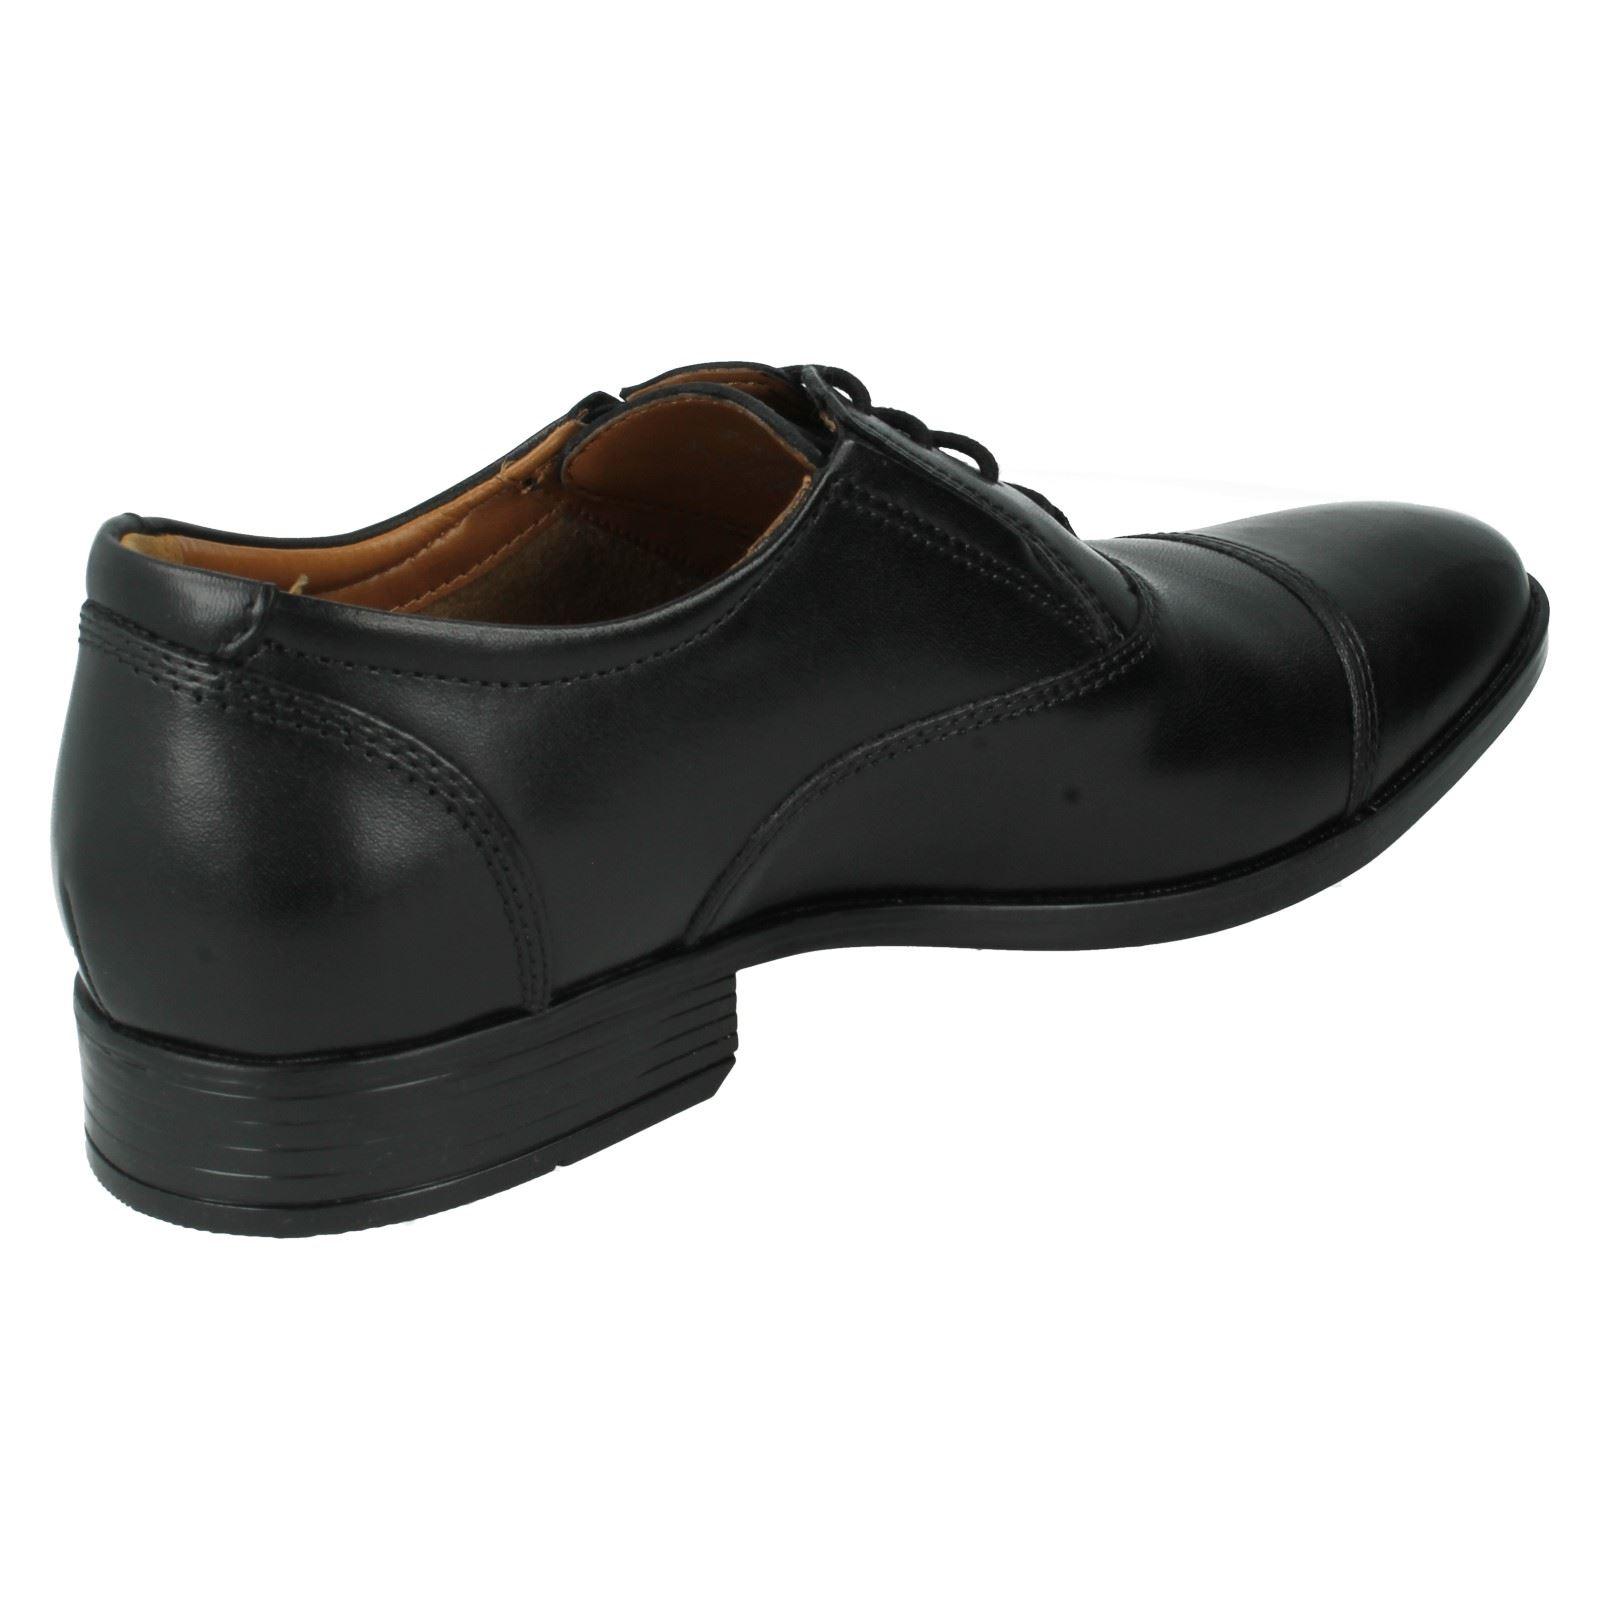 Mens Clarks  Formal Shoes Style -  Clarks Kalden Cap 3f0509